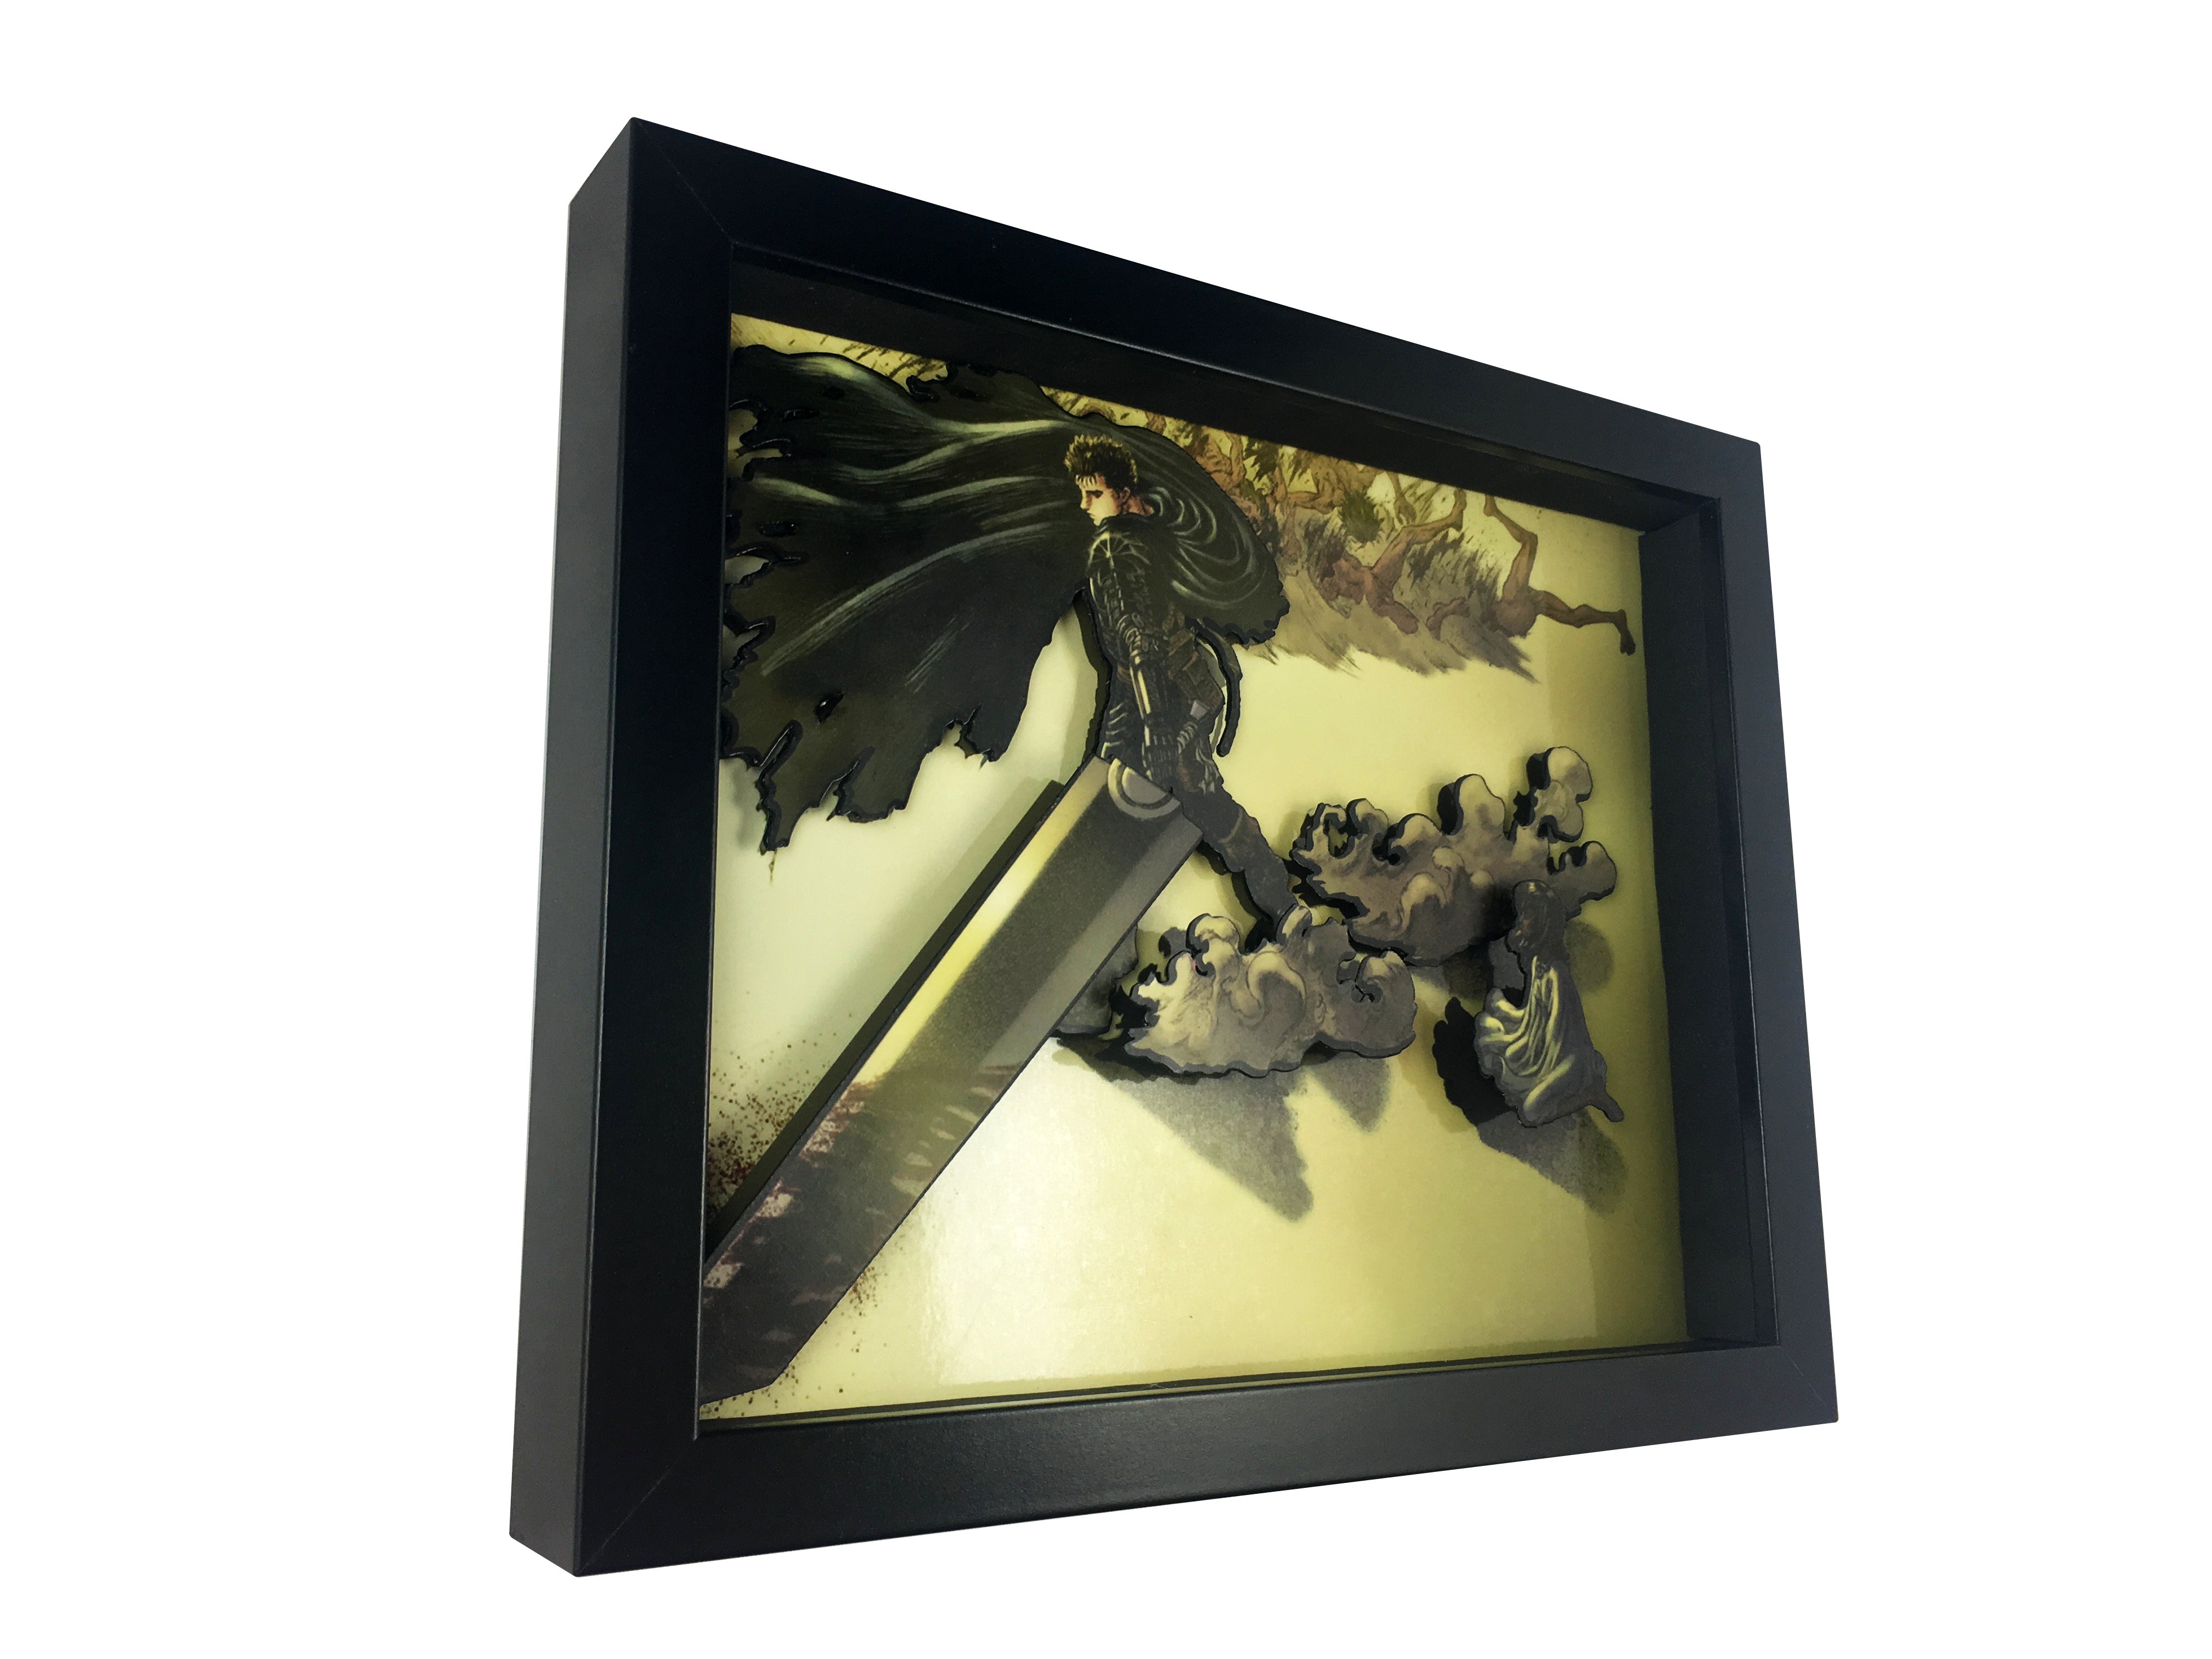 1.5 Deep Shadowbox Frame 13.5 x 40